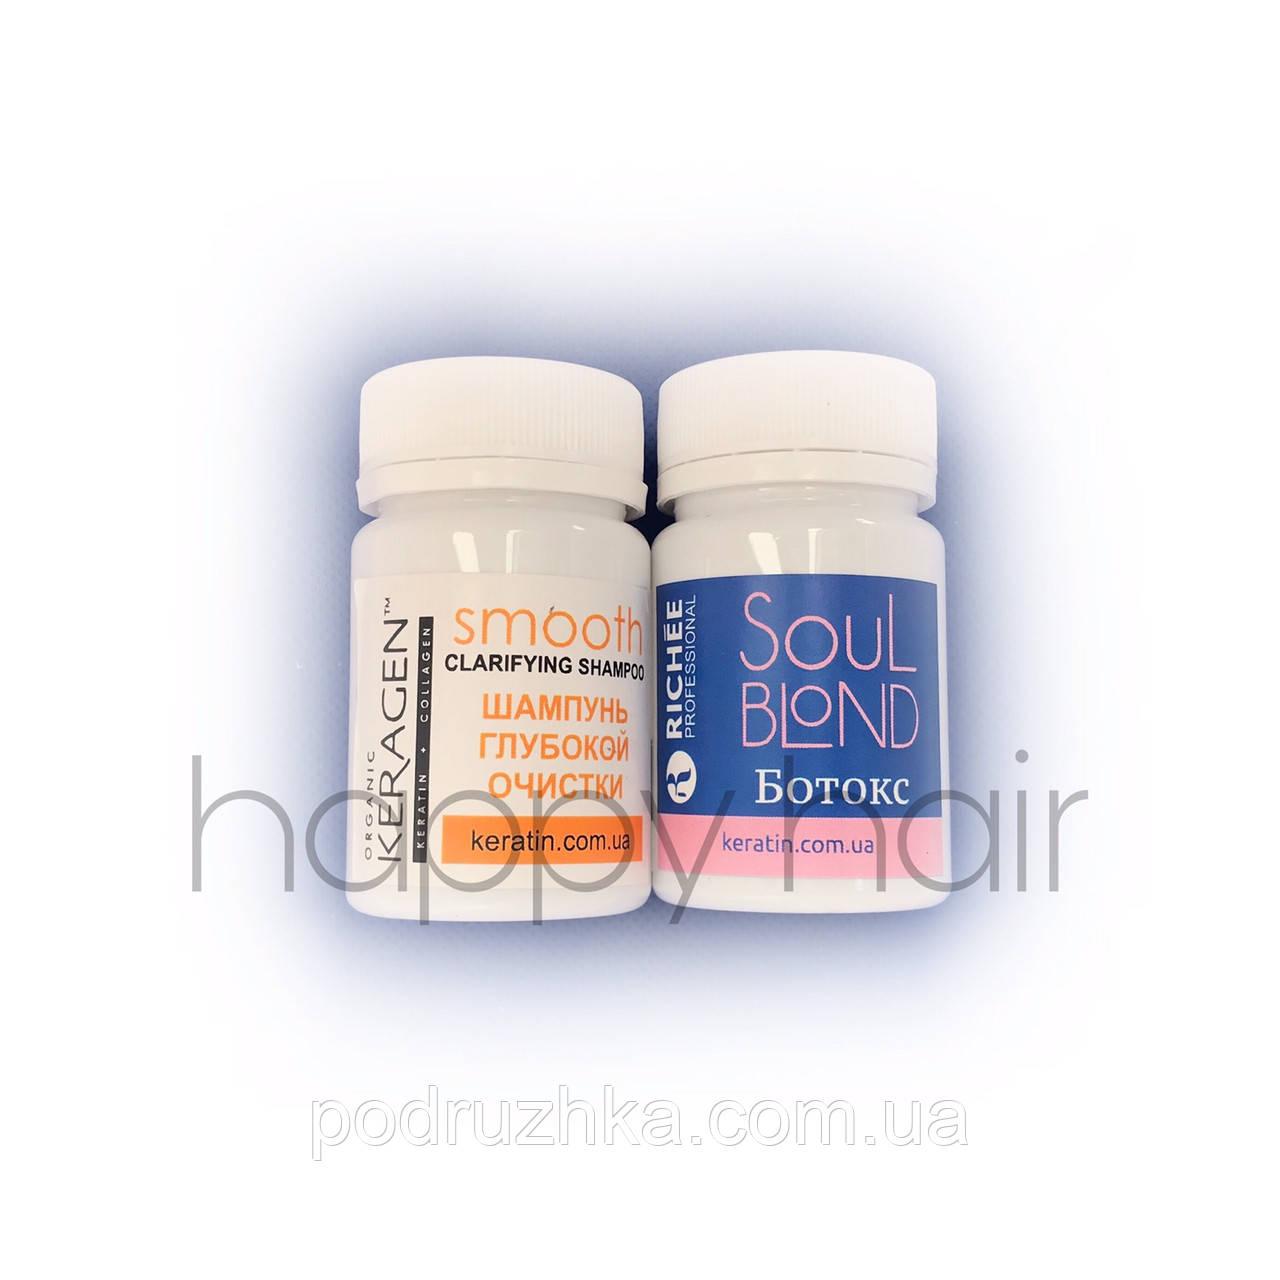 Набор ботокс для волос Ричи Richée Soul Blond 30/50 г